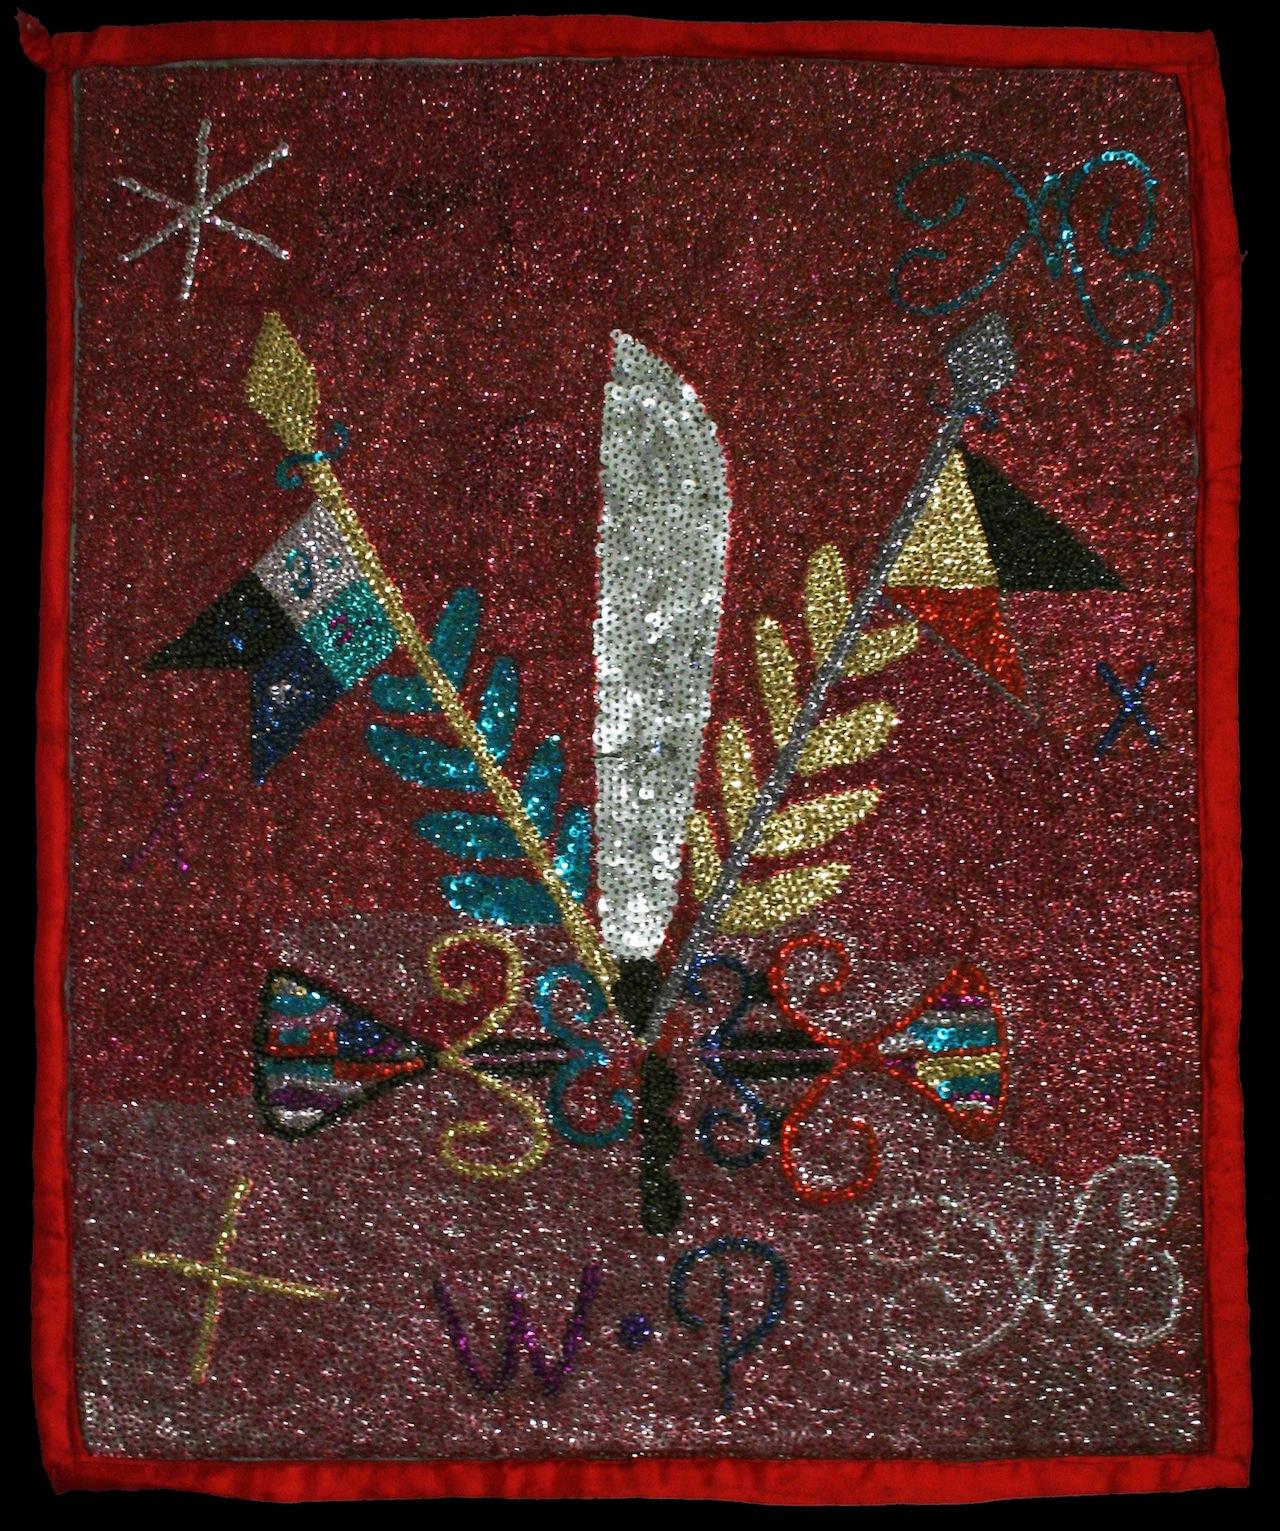 Ogoun (Rada) b Mid 20th century Satin, beads, sequins, polyester raffia, and thread 33 x 26 1/2 x 1/8 Courtesy Thomas Schultz Collection